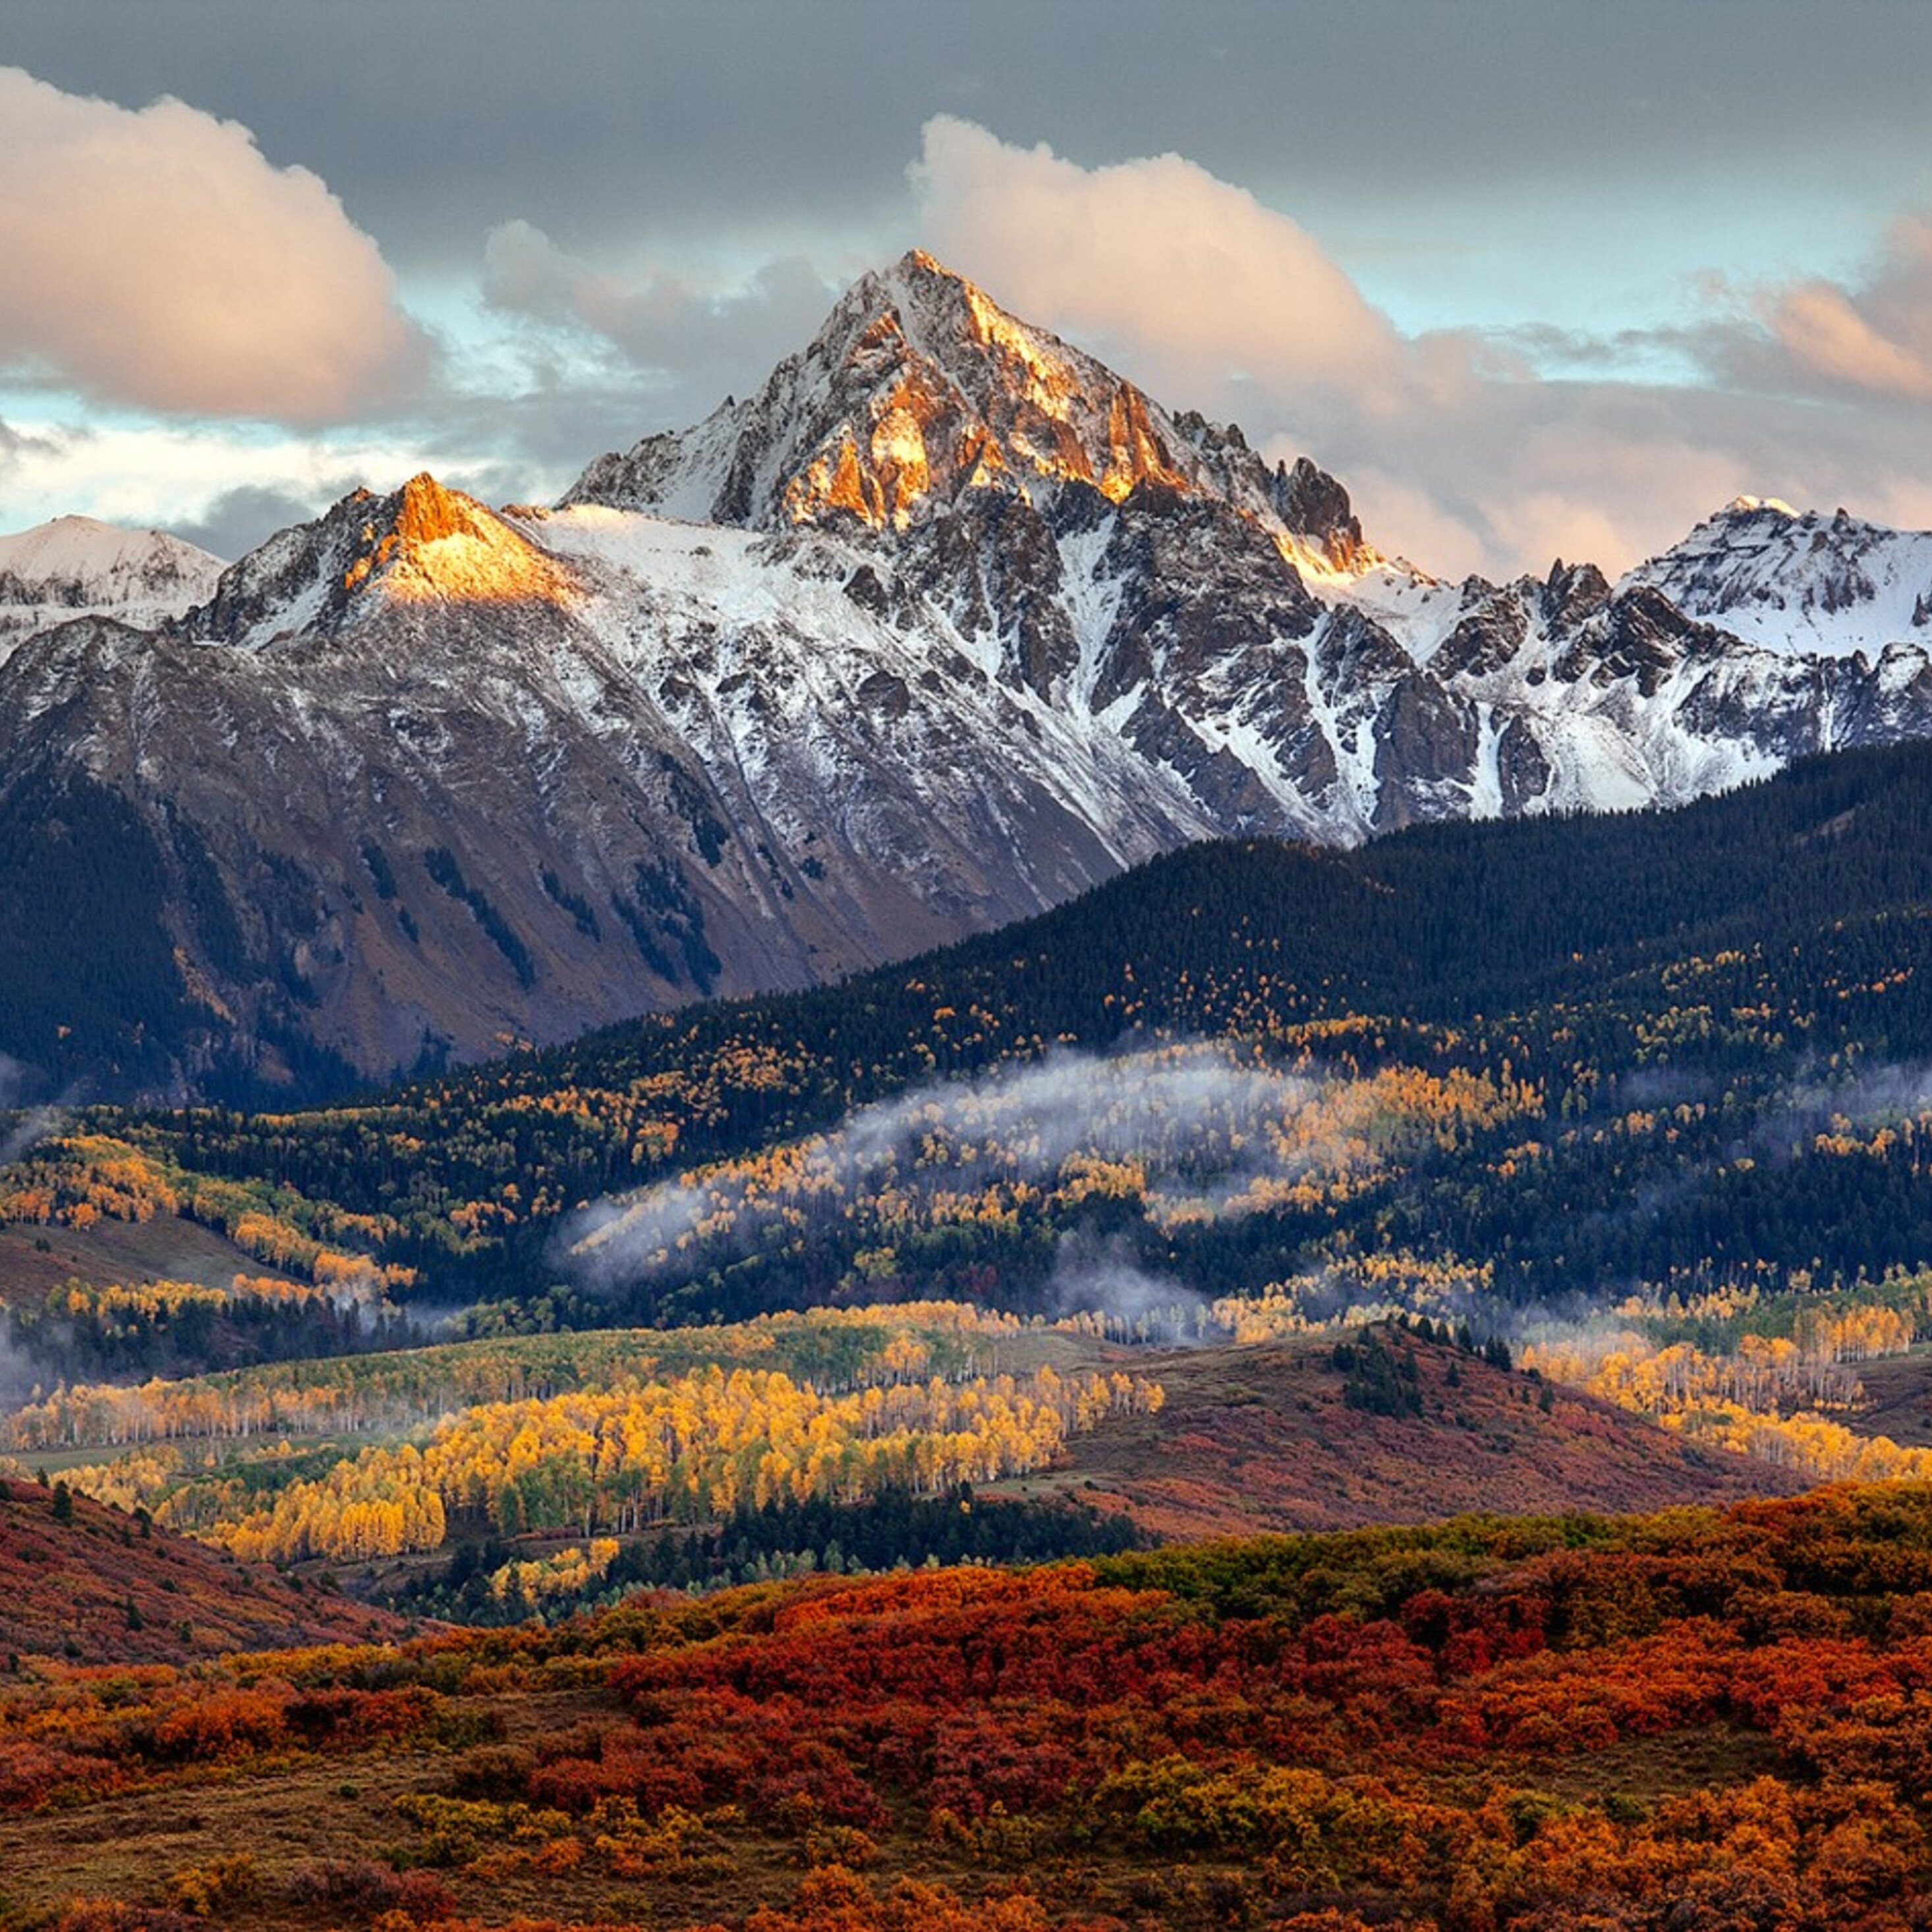 Most Inspiring Wallpaper Mountain Ipad Pro - colorado-mountains-4k-2932x2932  Pictures_319253.jpg